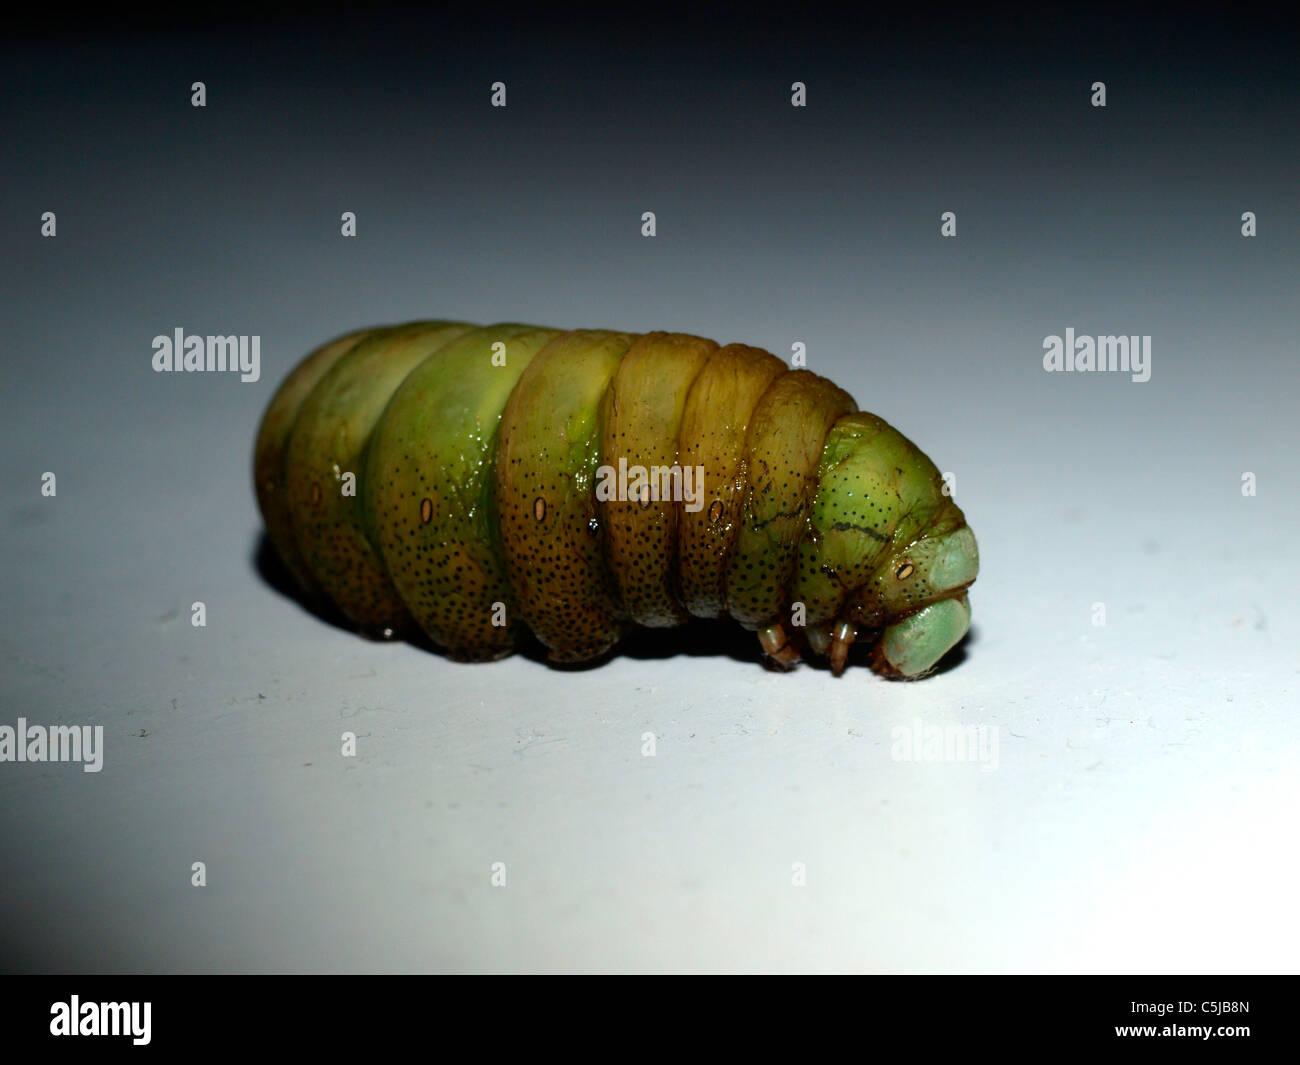 Hawk-moth caterpillar on white background in a dark - Stock Image